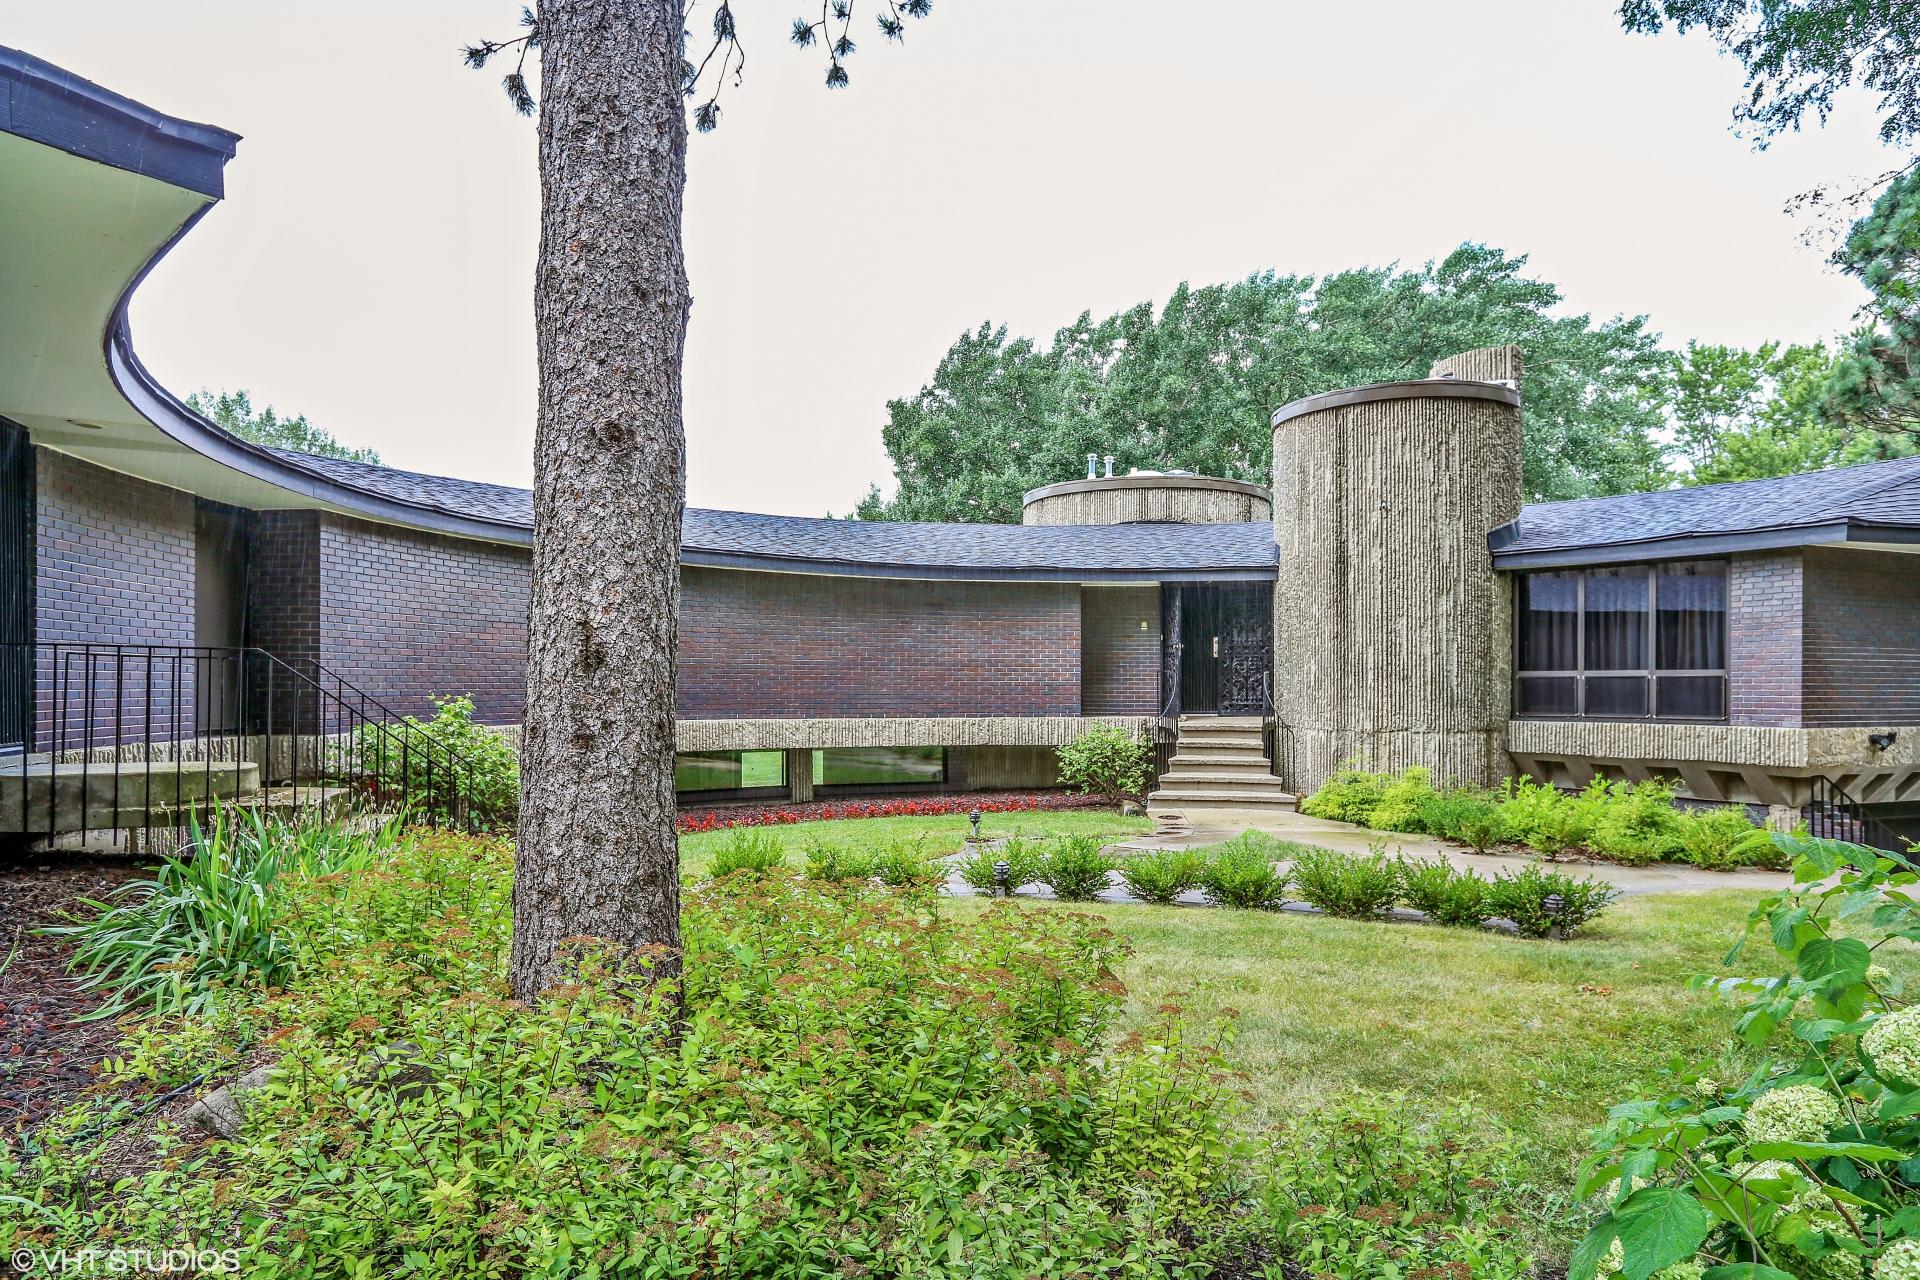 Semi-Circular Hillside Ranch Based on a Design by Dean Bryant Vollendorf